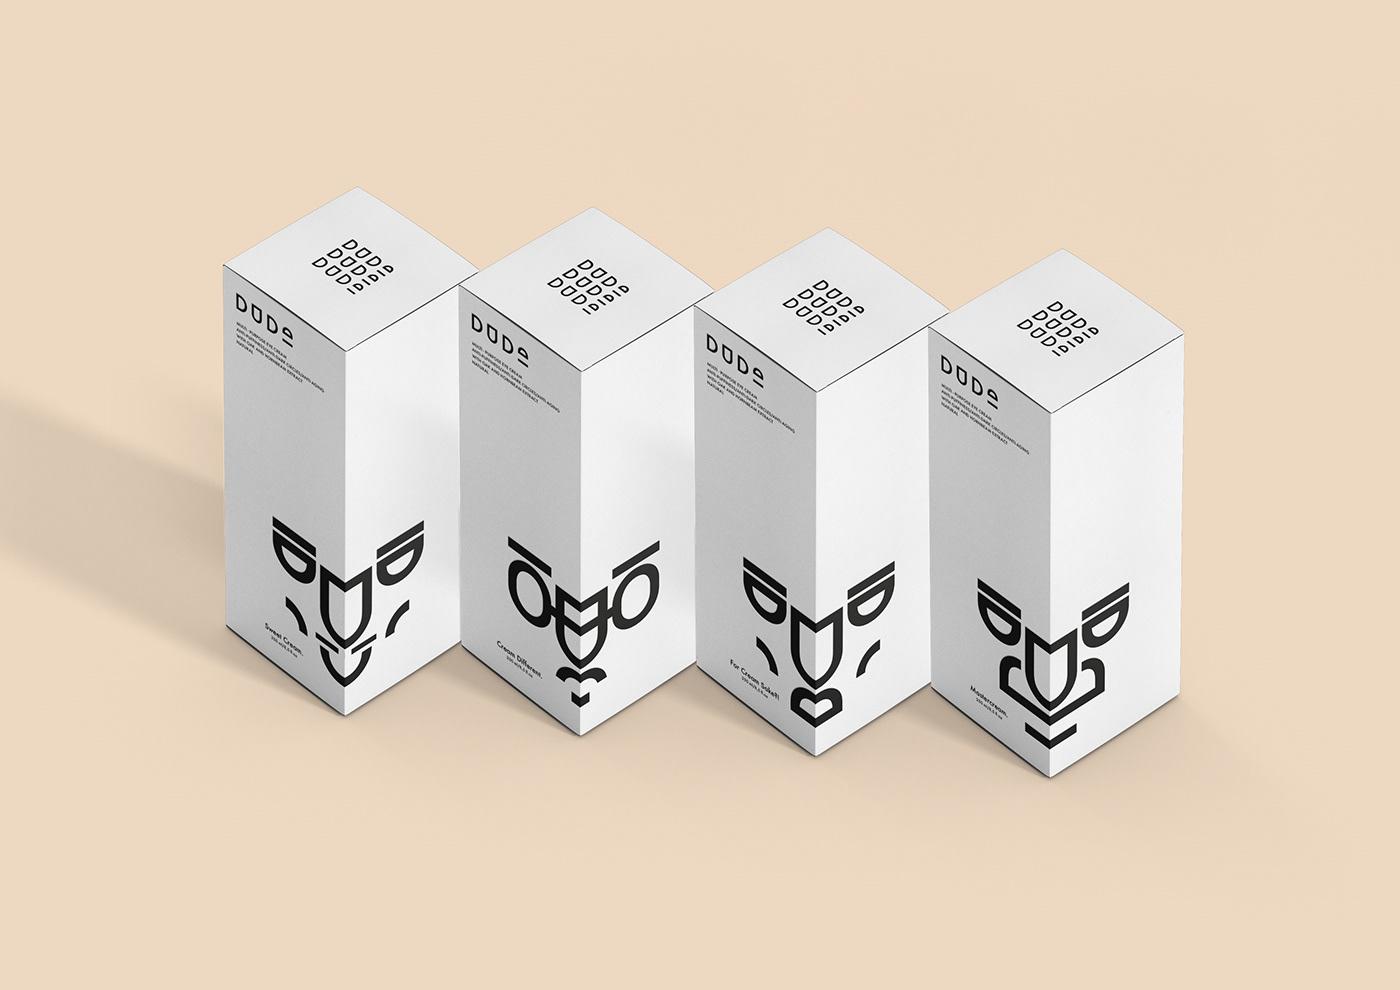 design Illustrator student InDesign branding  process idea Original minimalist got